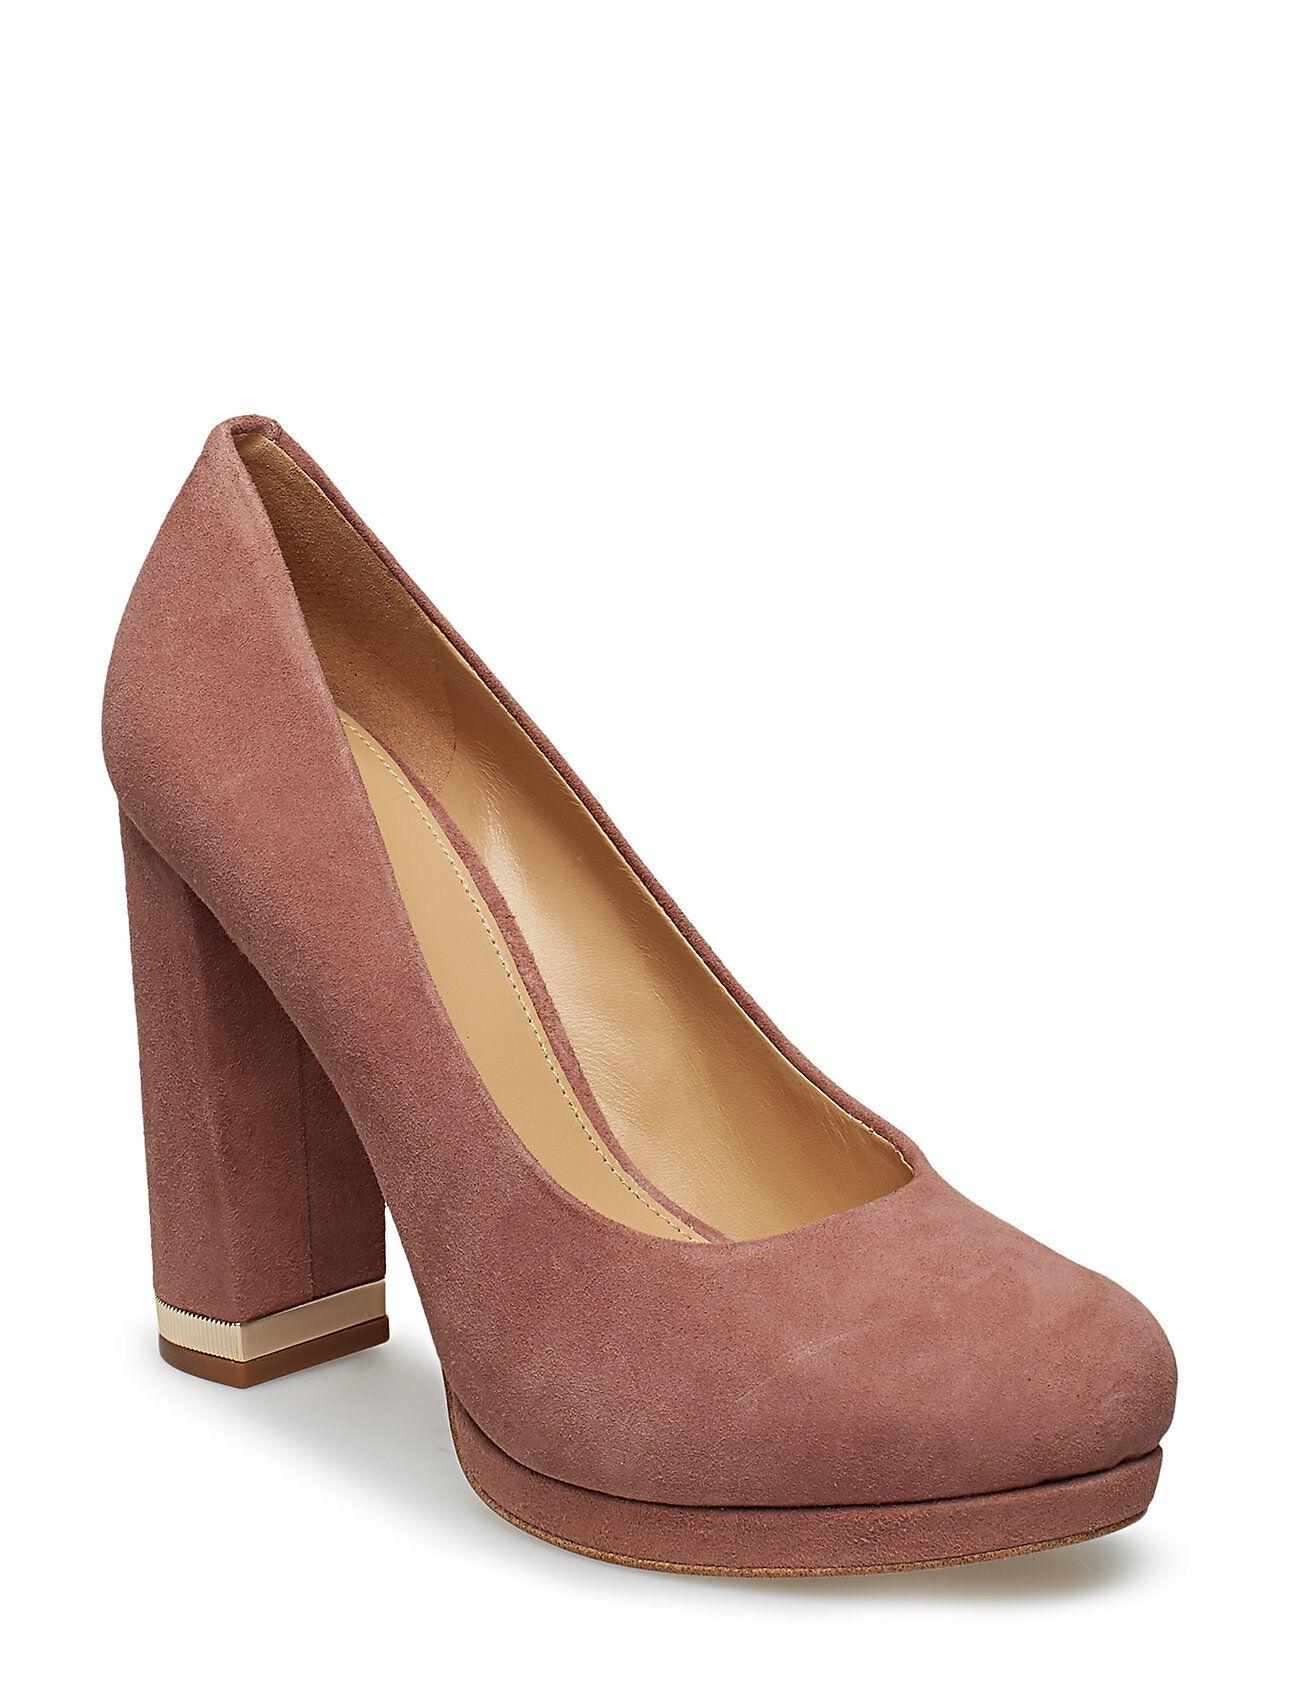 Michael Kors Shoes Valerie Closed Toe